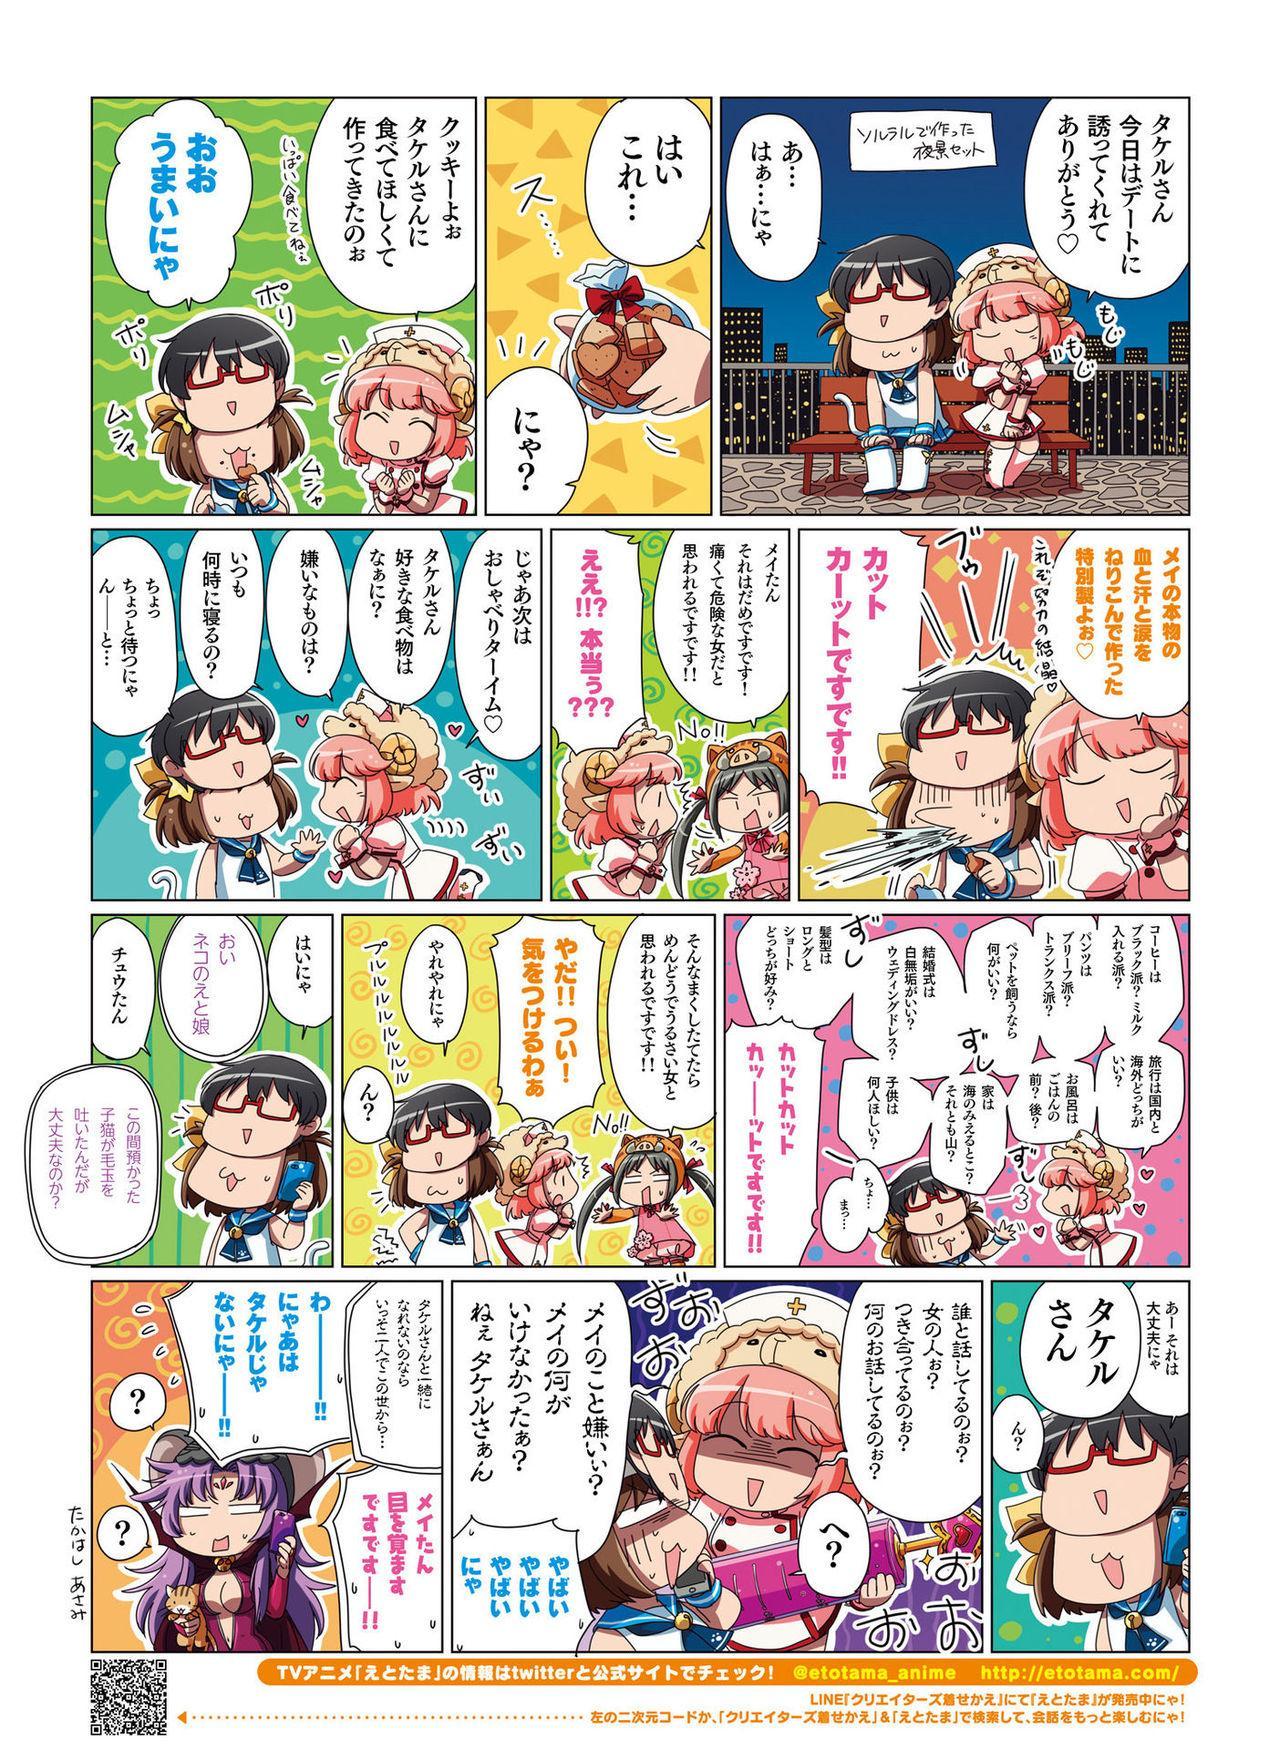 Dengeki Moeoh 2017-06 60